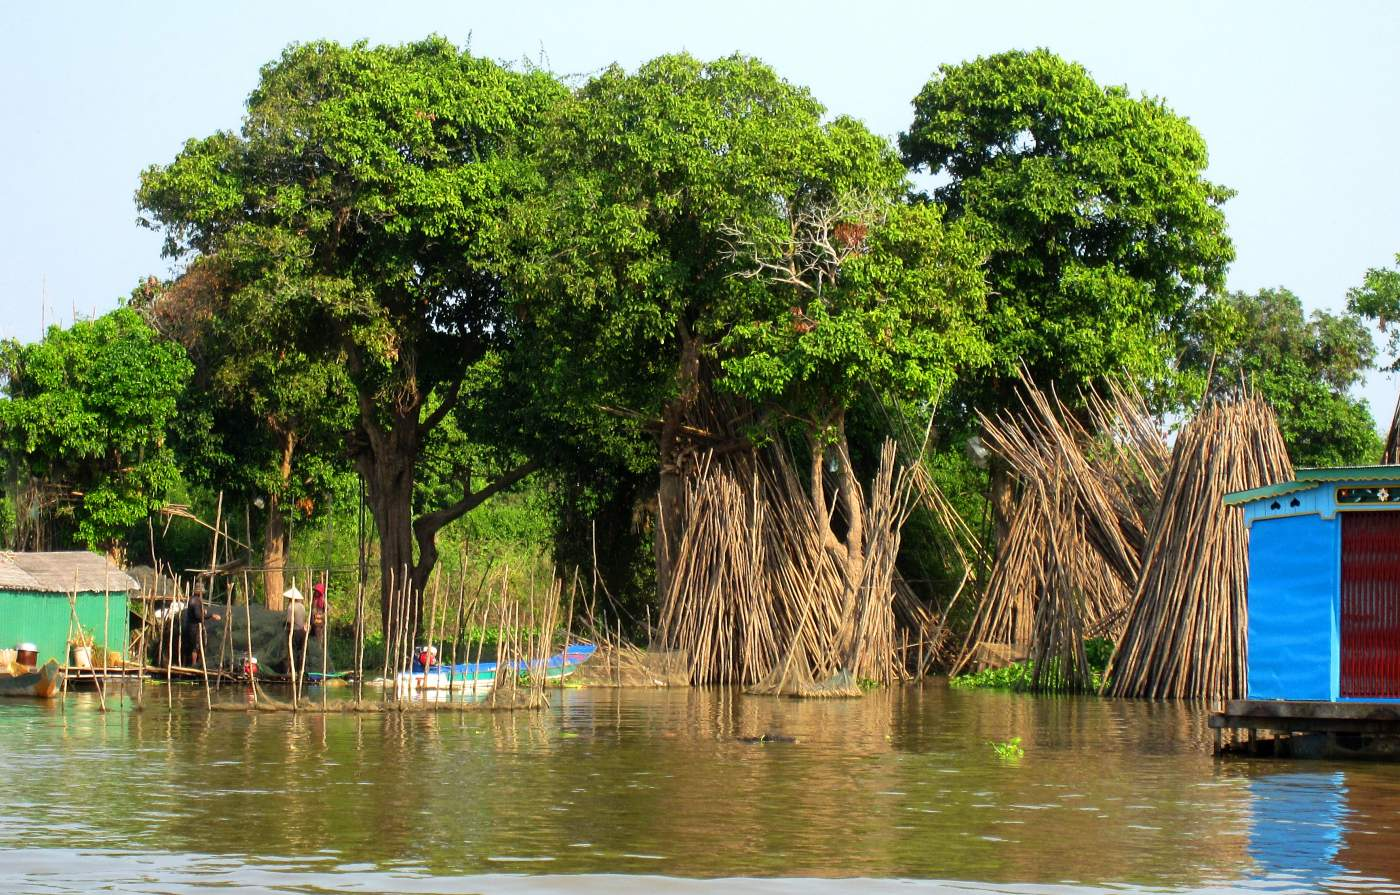 Kambodscha Naturschutz Reisen Motorrad Reise